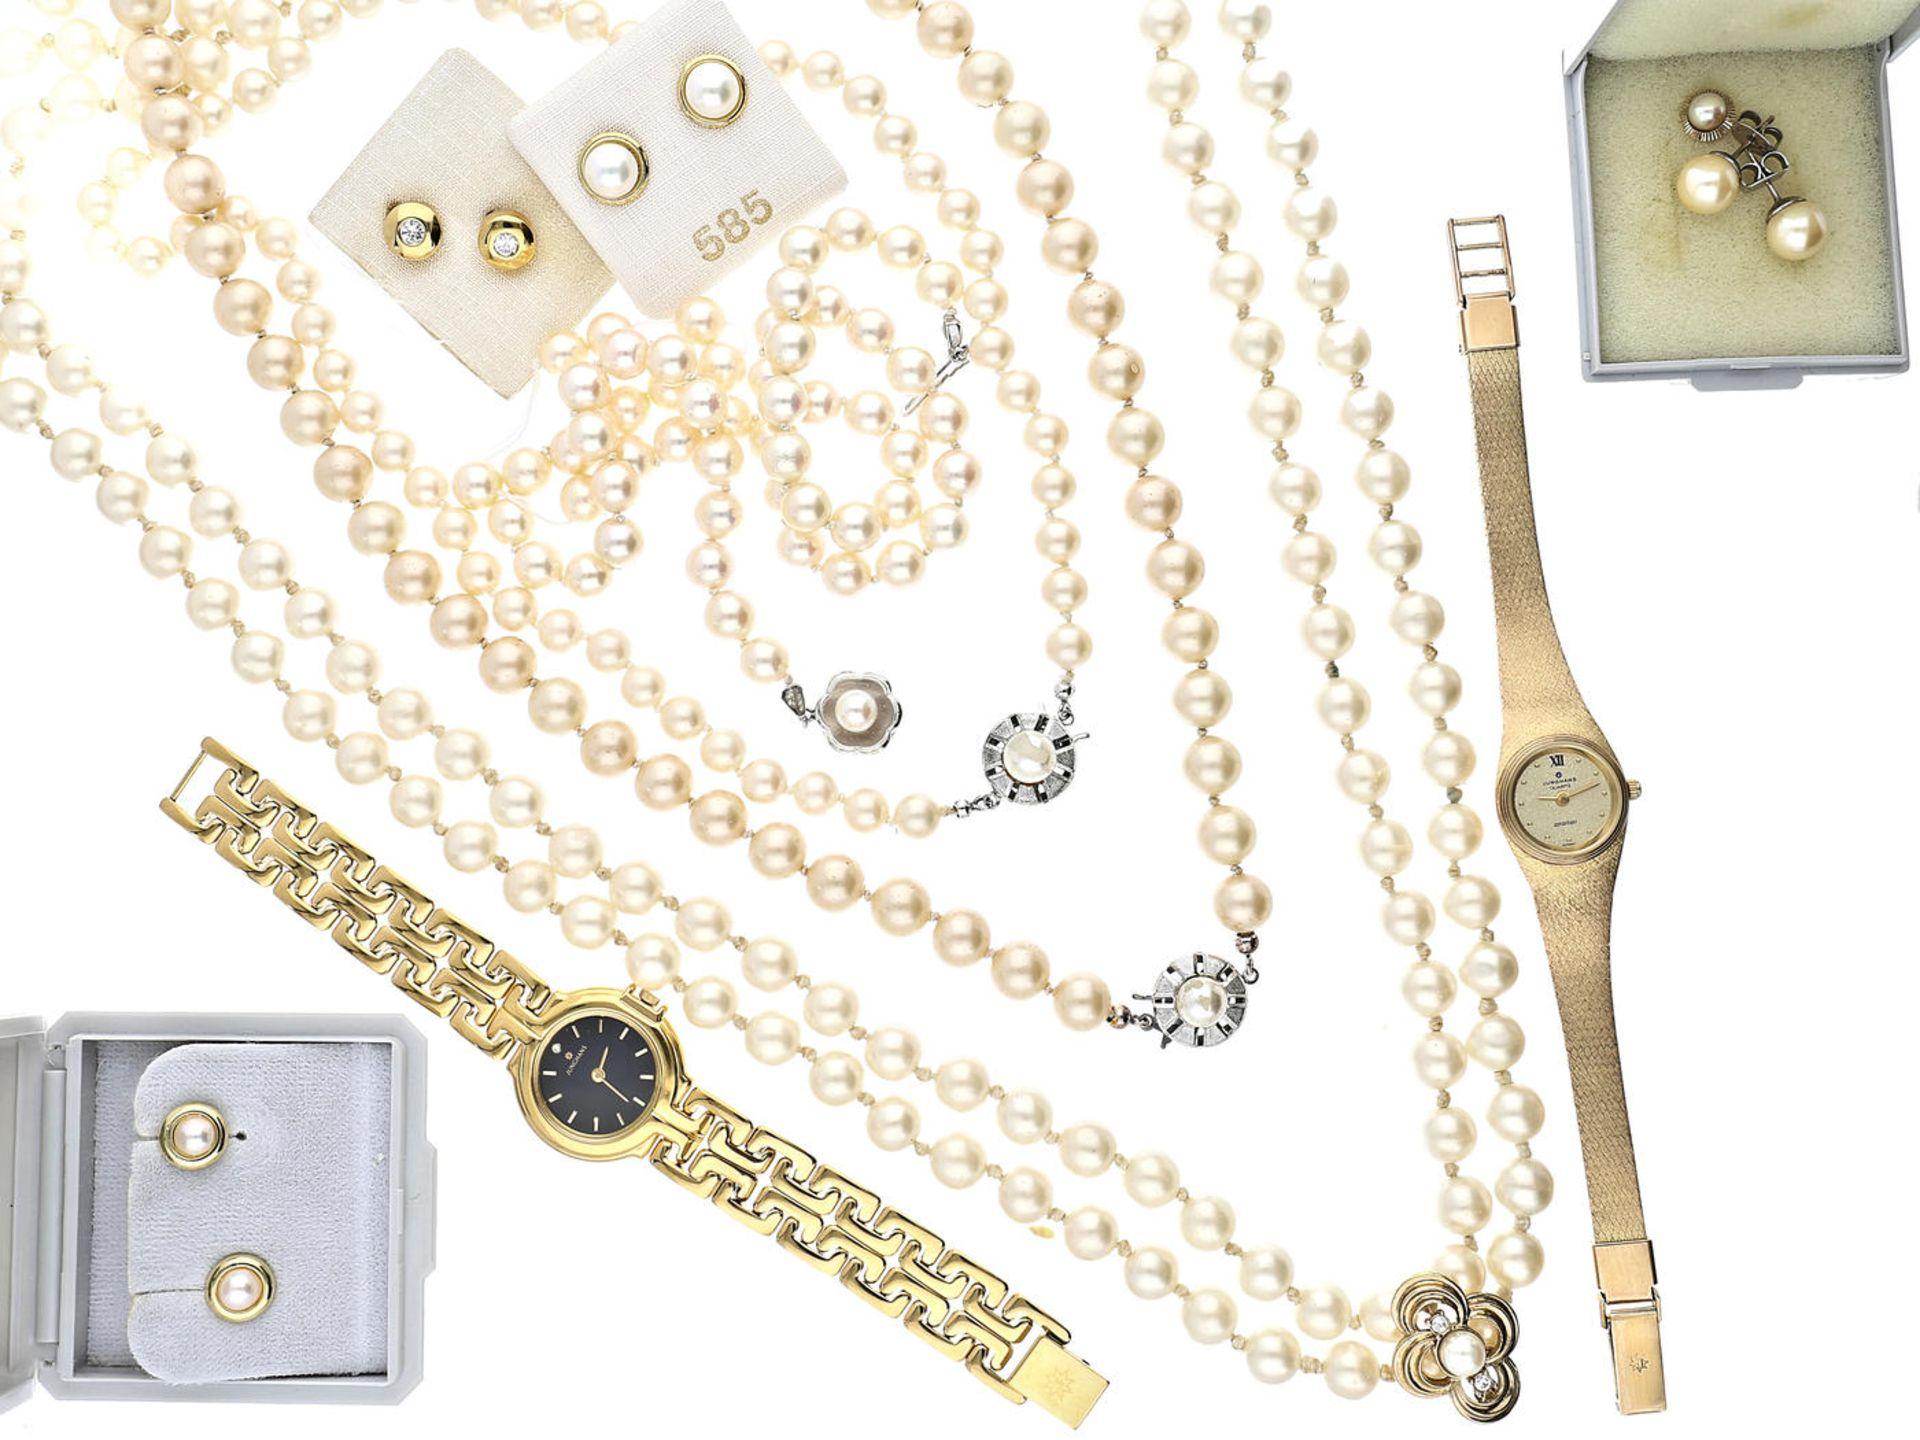 Kette/Ohrstecker/Armbanduhr: Konvolut vintage Schmuck 1. Damenuhr der Marke Junghans, ca. Ø24mm,